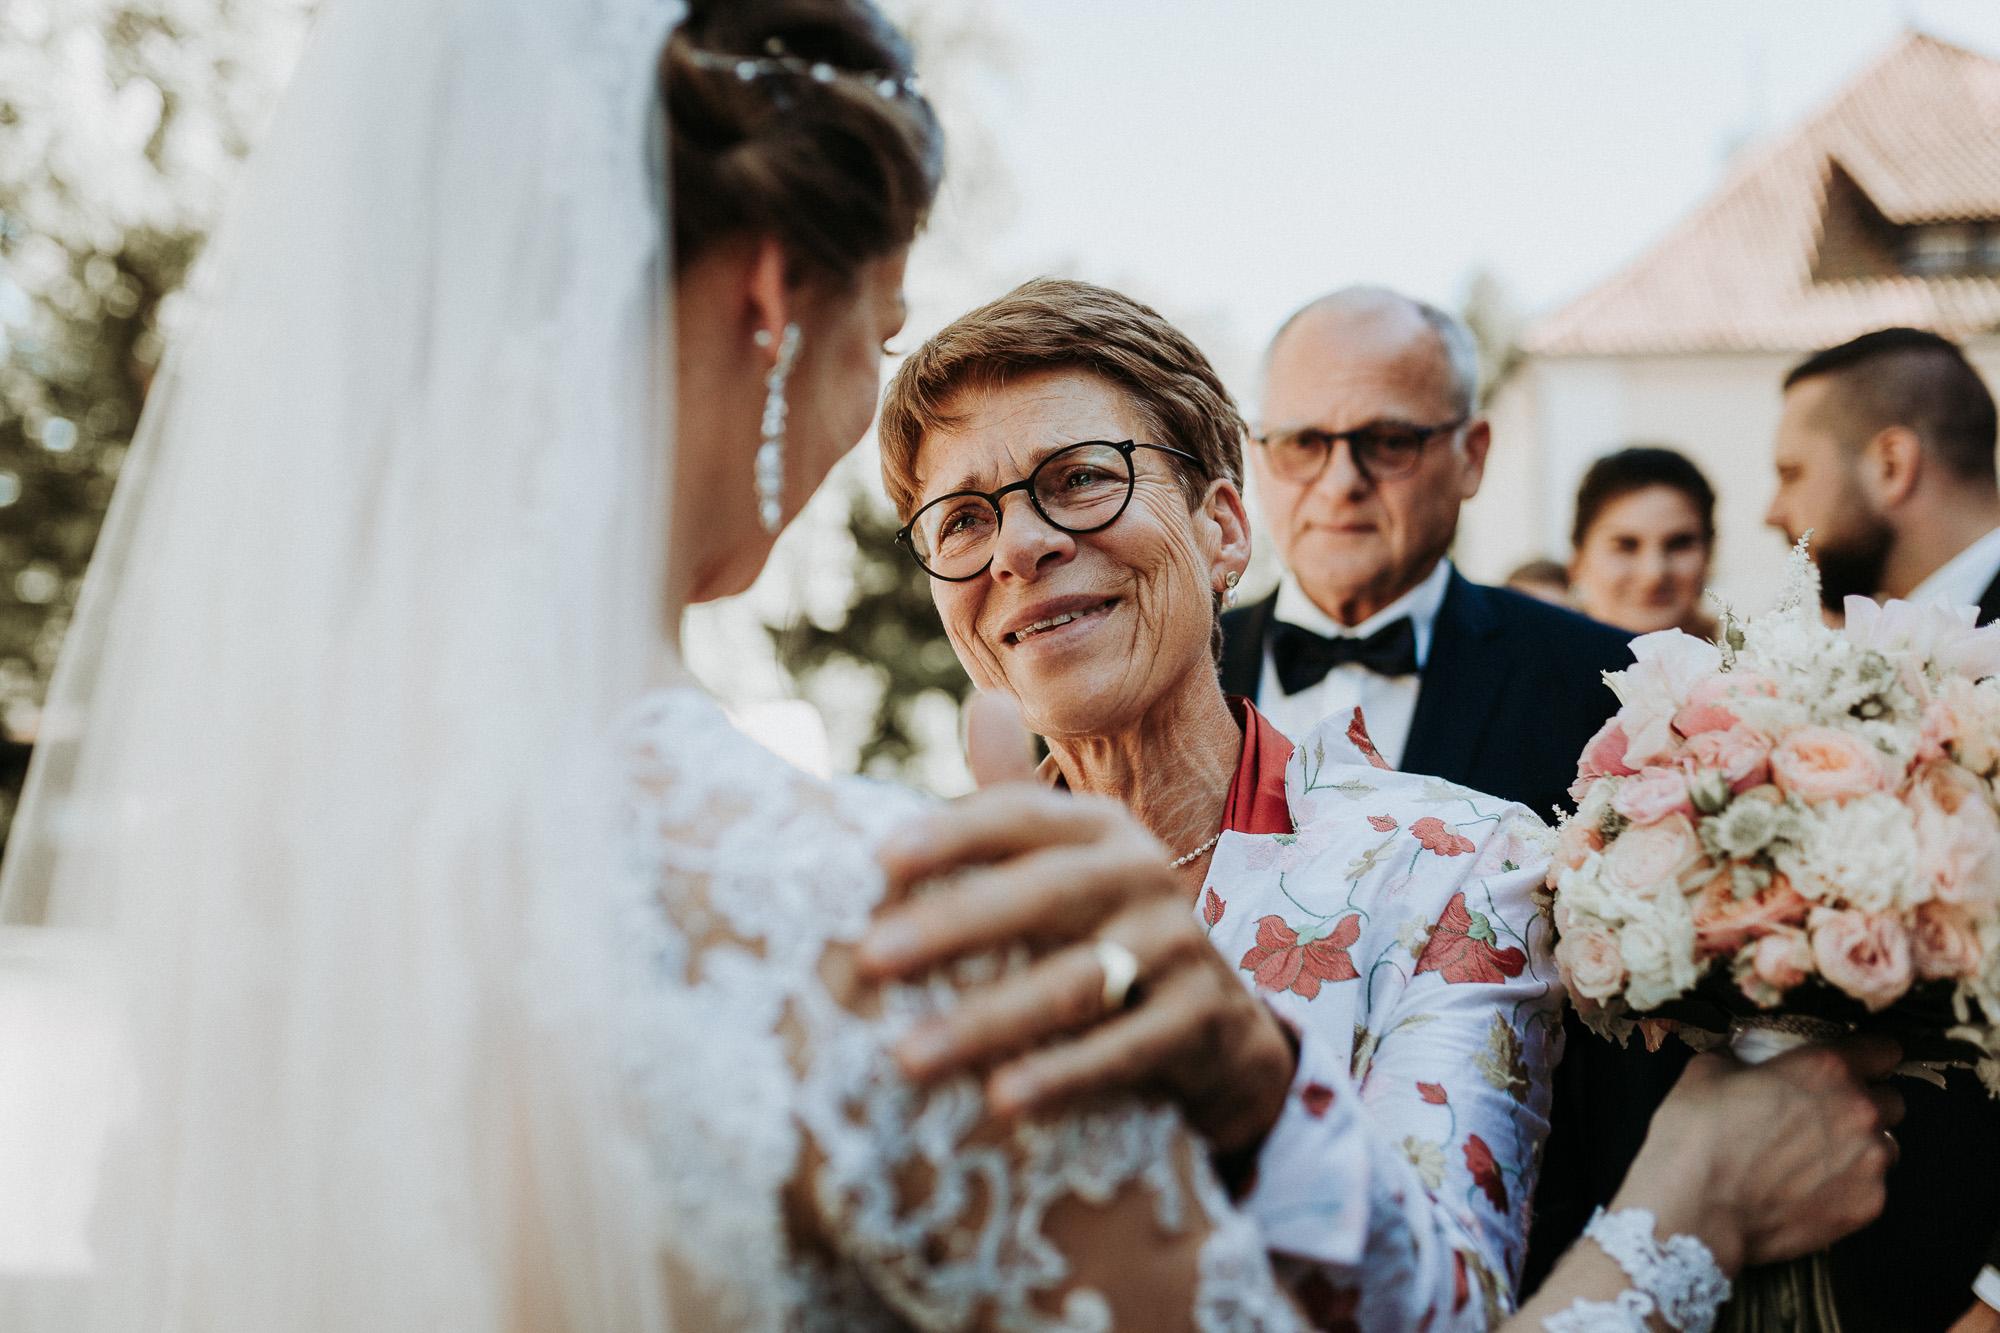 DanielaMarquardtPhotography_Hochzeitsfotograf_Düsseldorf_Köln_Mallorca_Bayern_Austria_Harz_Wedding_AileenundLennart_Weddingphotographer_Ibiza_Tuskany_Italien_Toskana_Portugal_Lissabon157